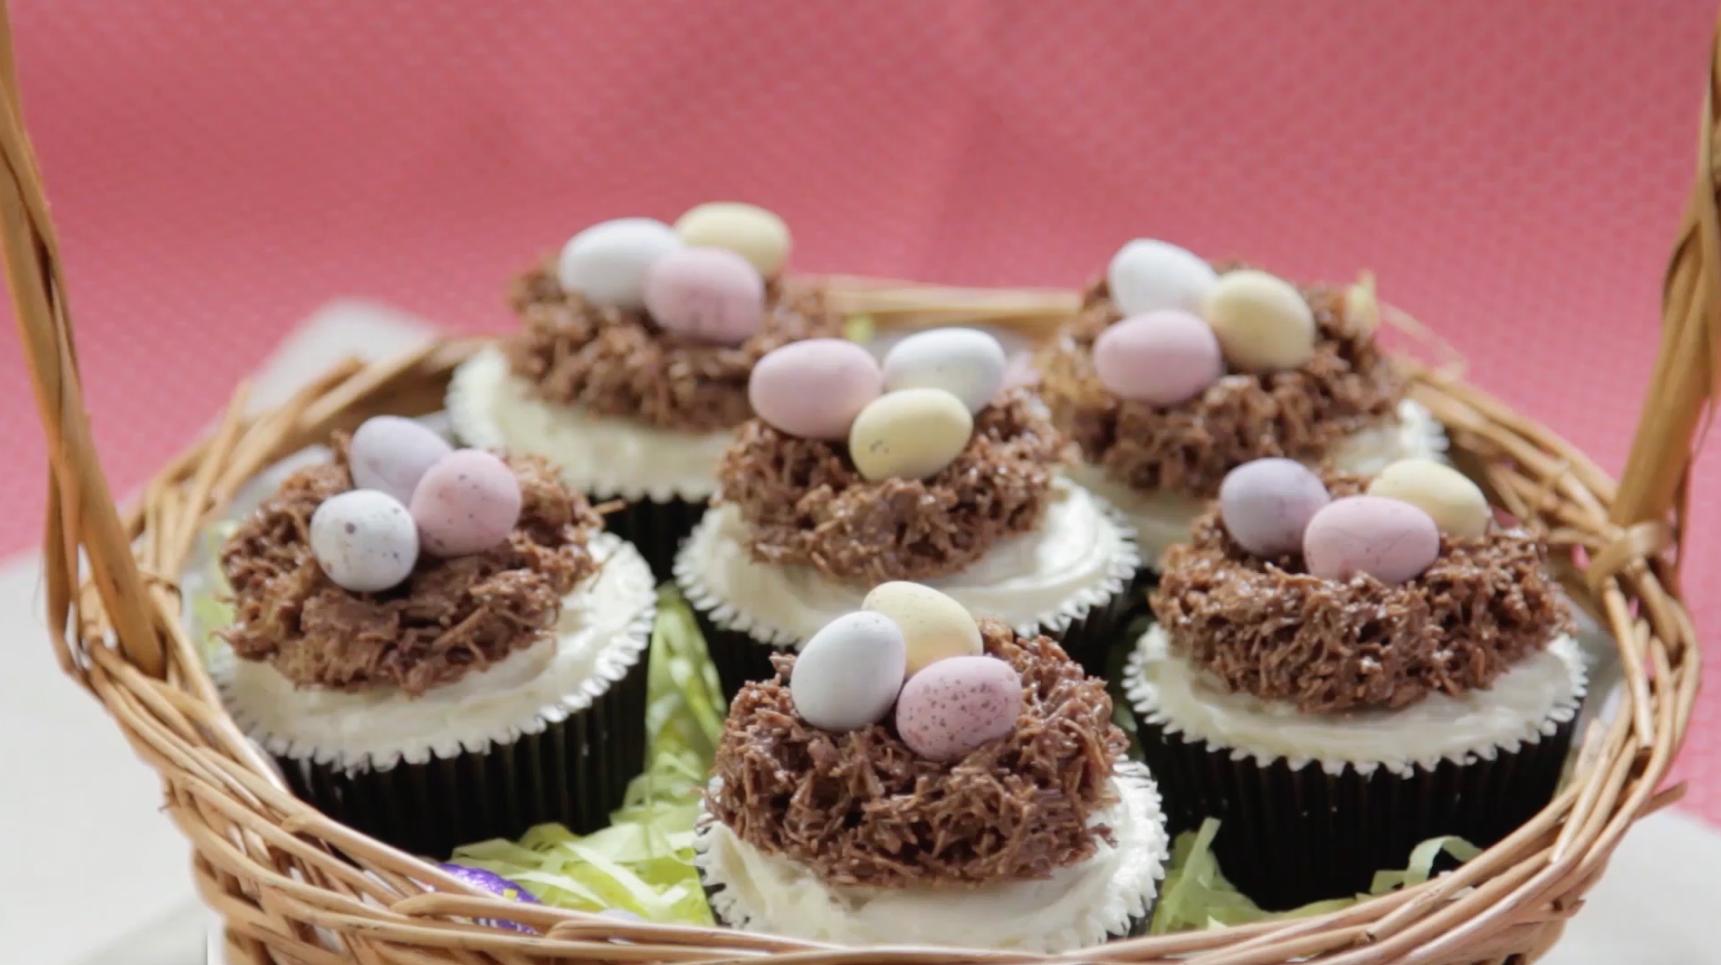 How to Make Hidden Centre Easter Egg Nest Cupcakes